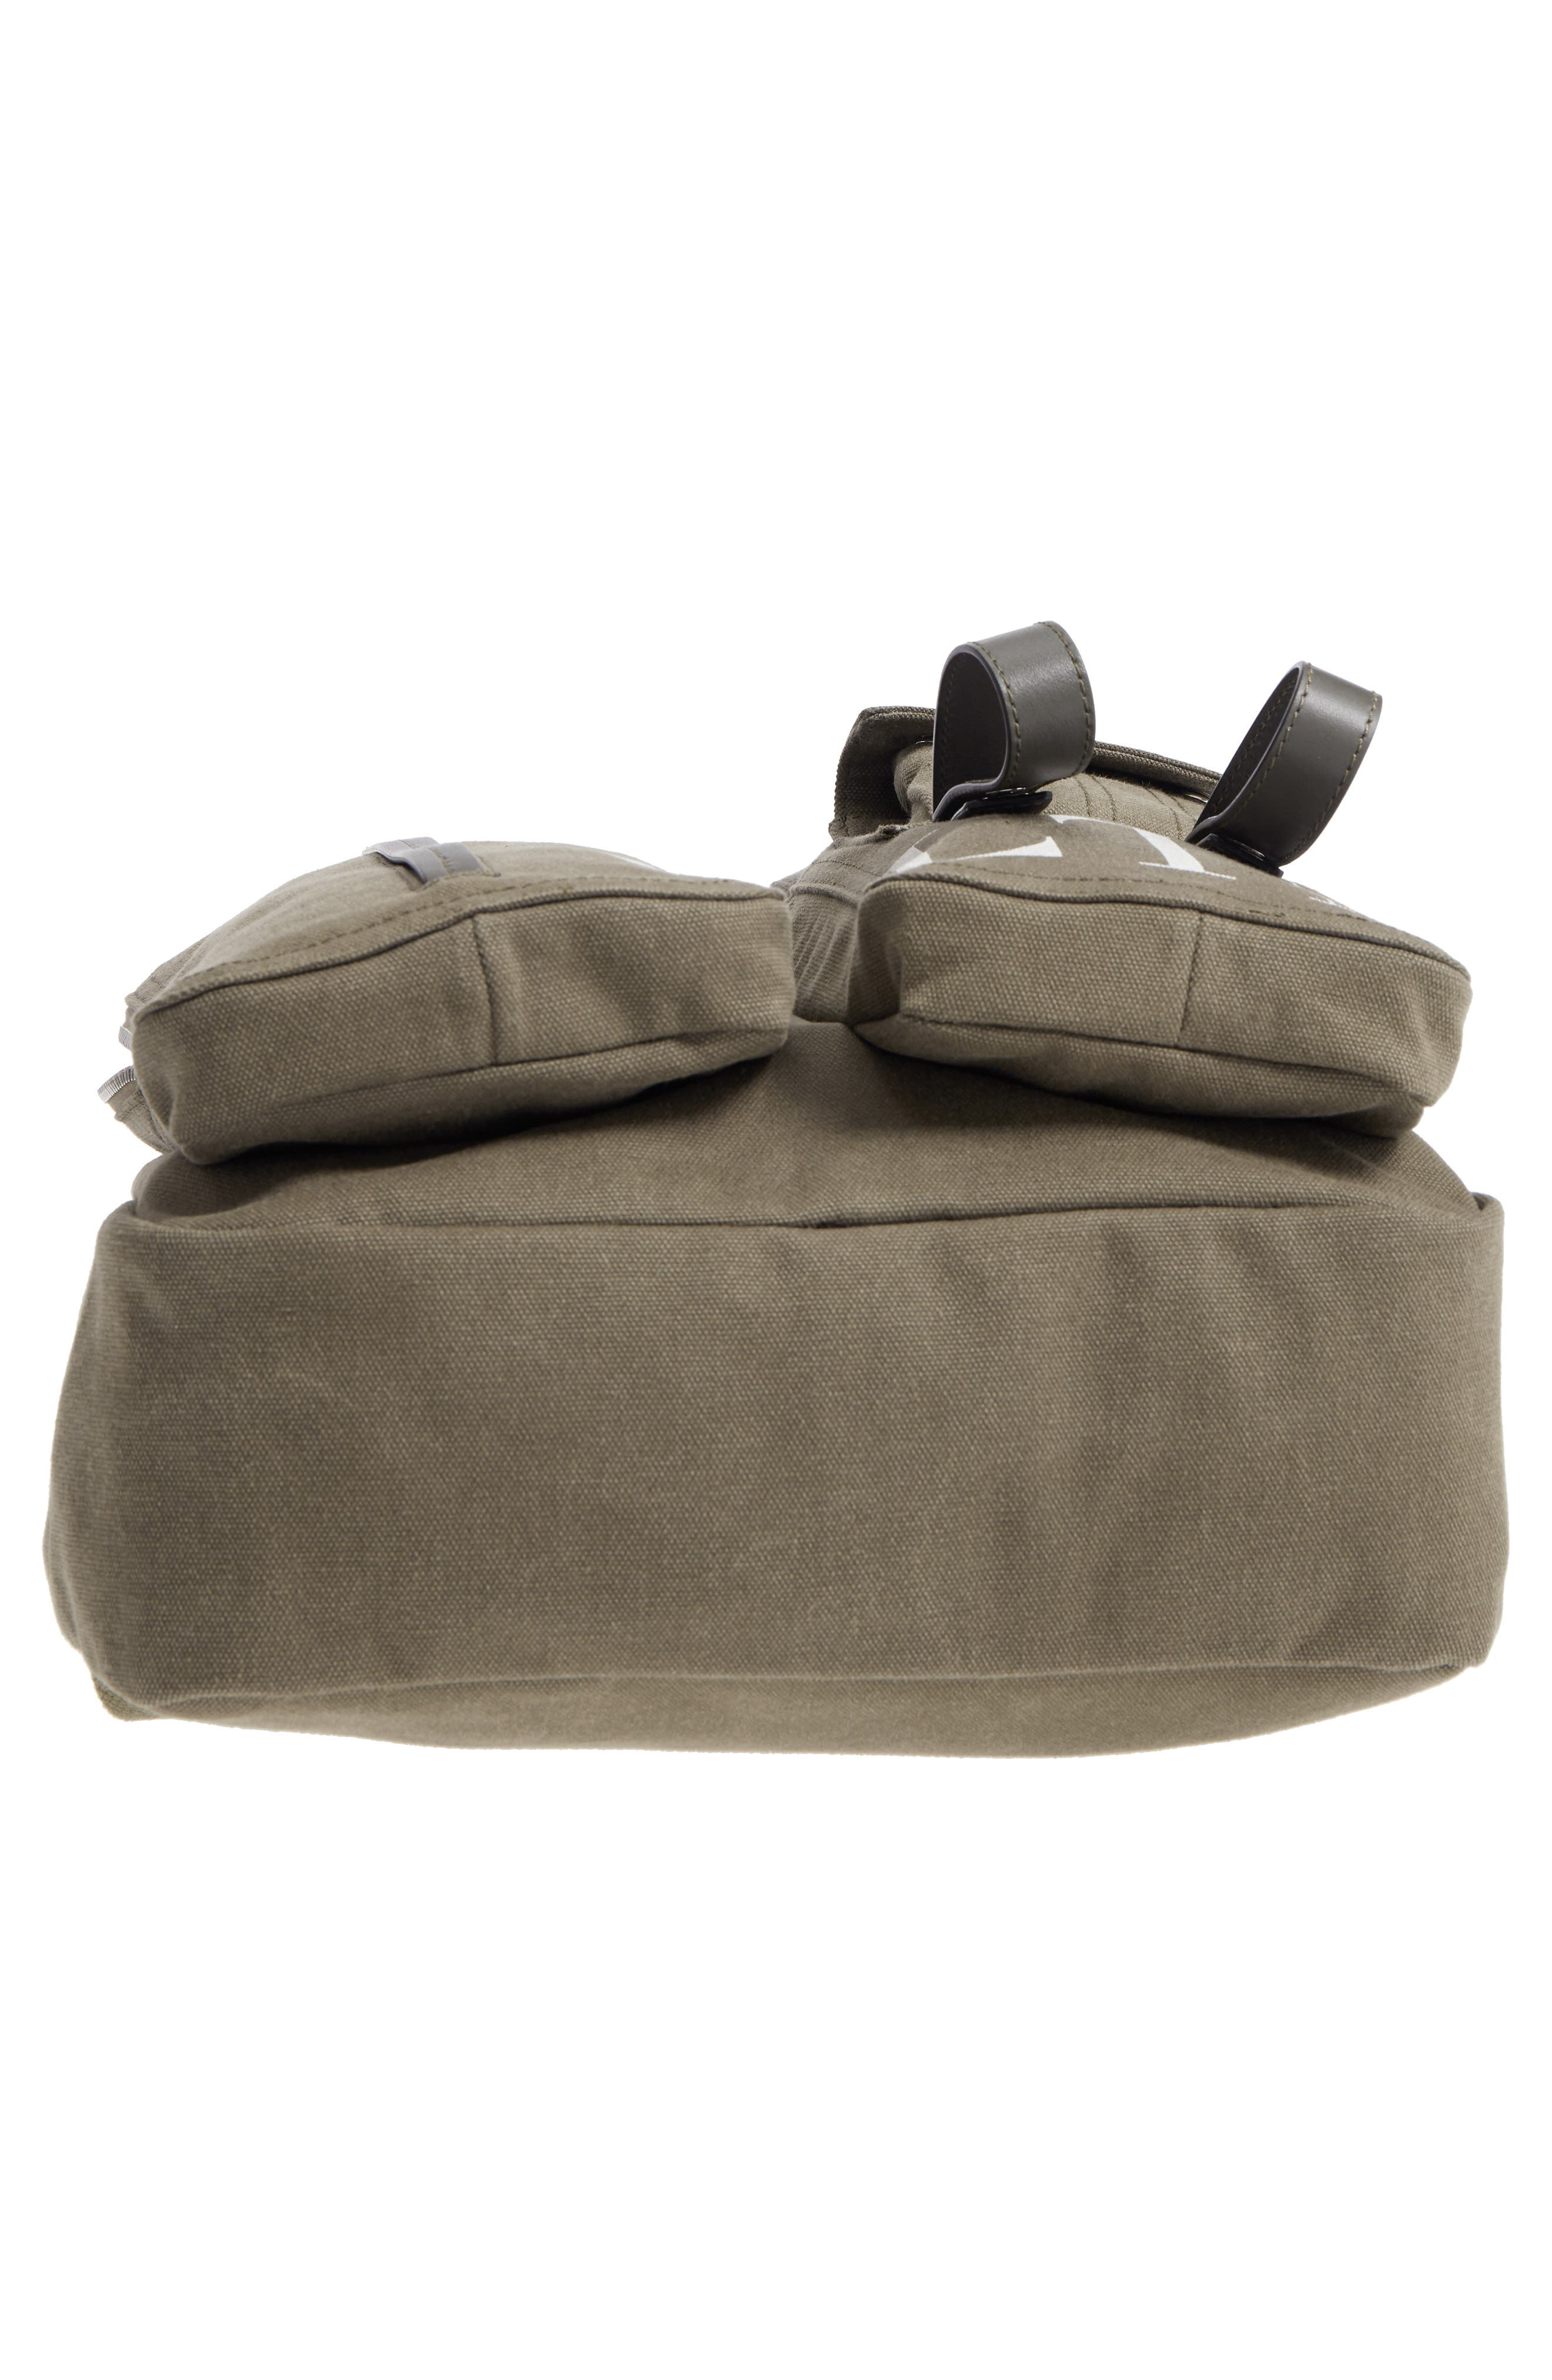 GARAVANI Canvas Military Backpack,                             Alternate thumbnail 6, color,                             L90 Olive